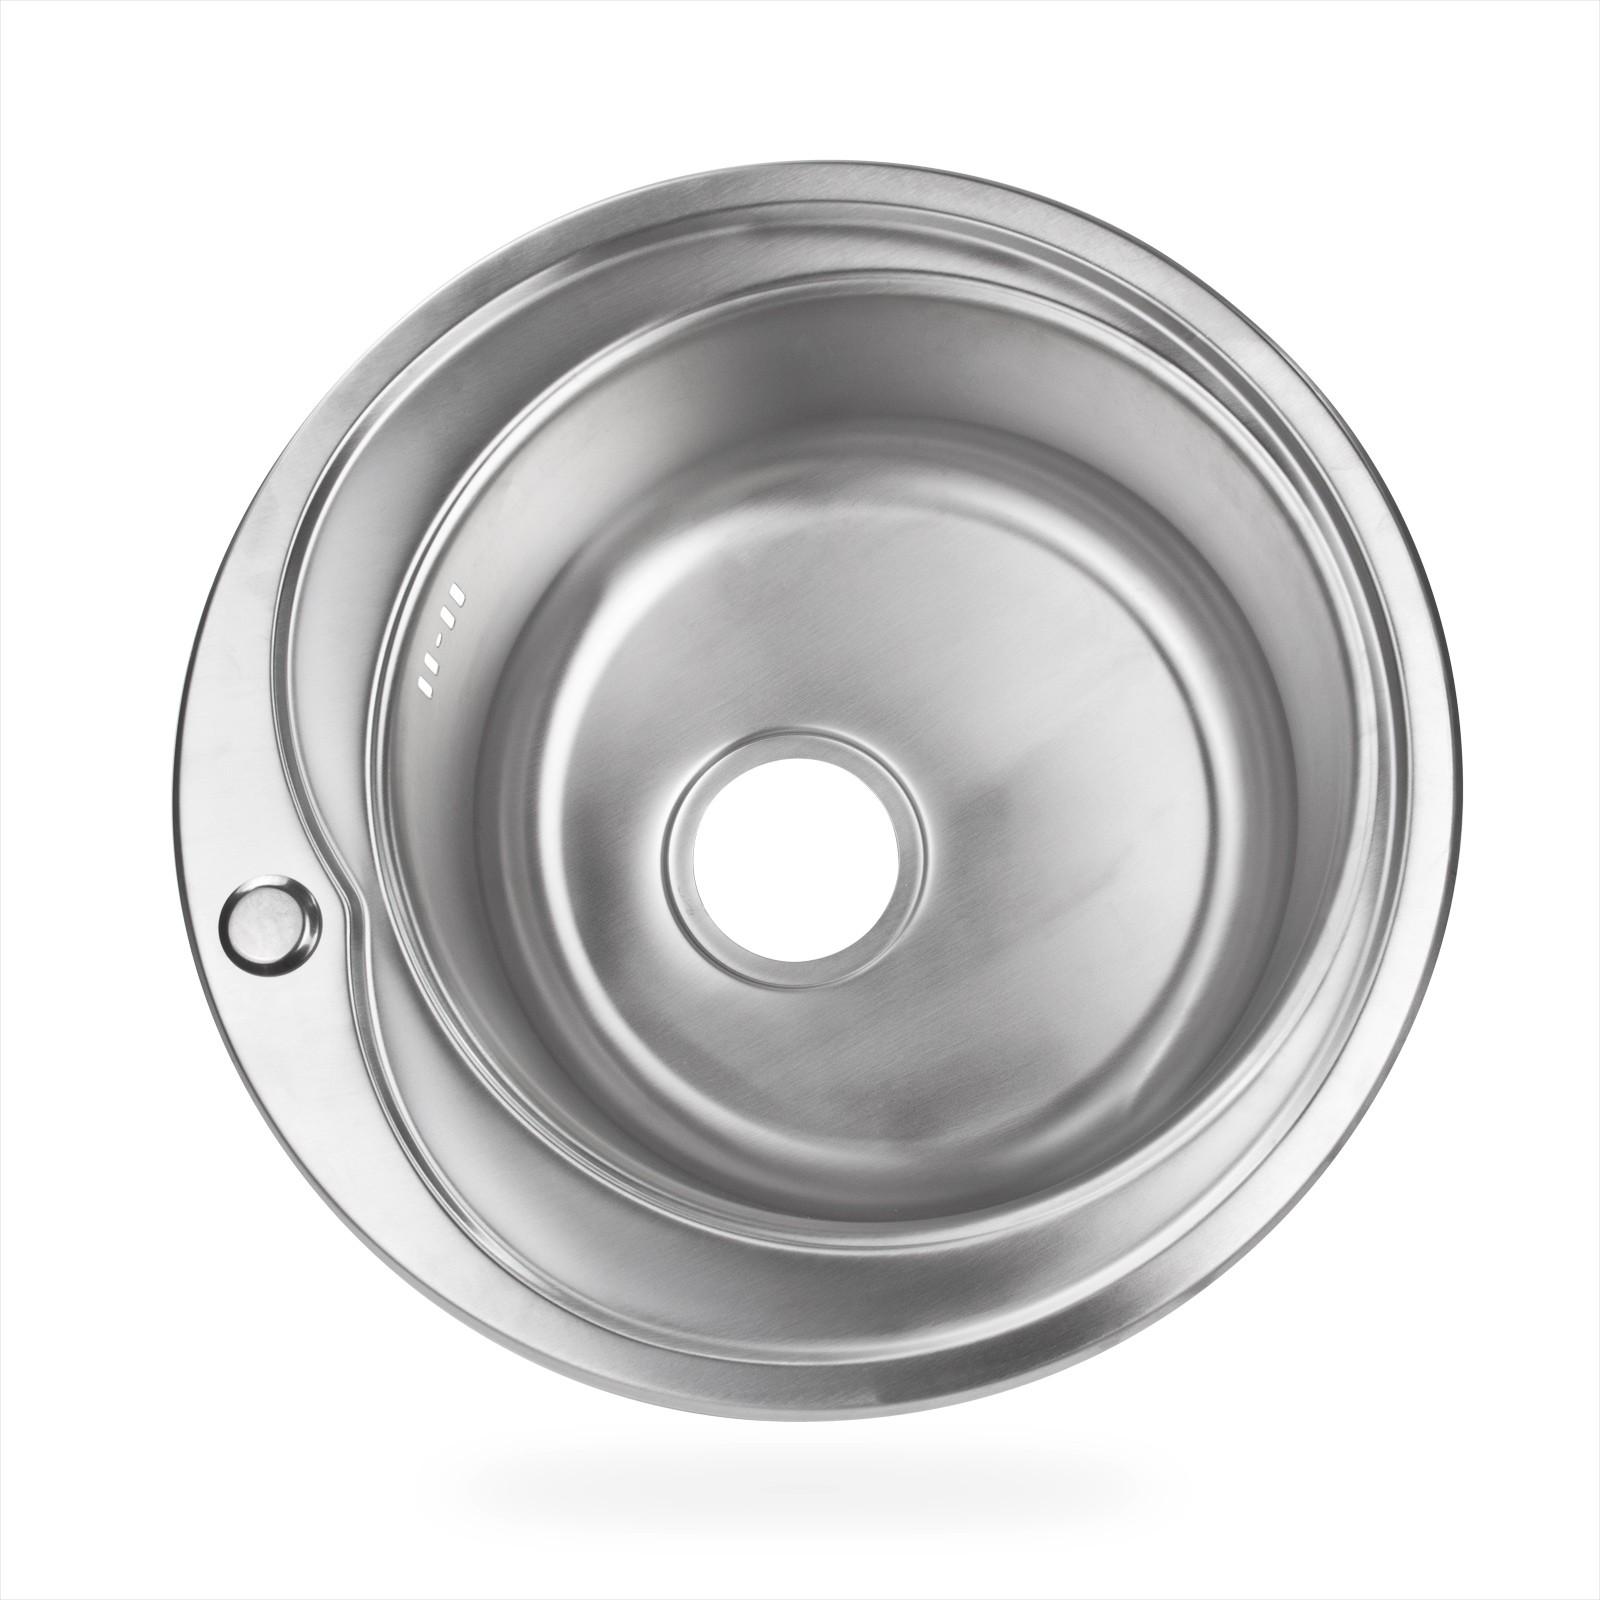 Edelstahl Einbauspüle Ronda2 Waschbecken Spüle Küchenspüle